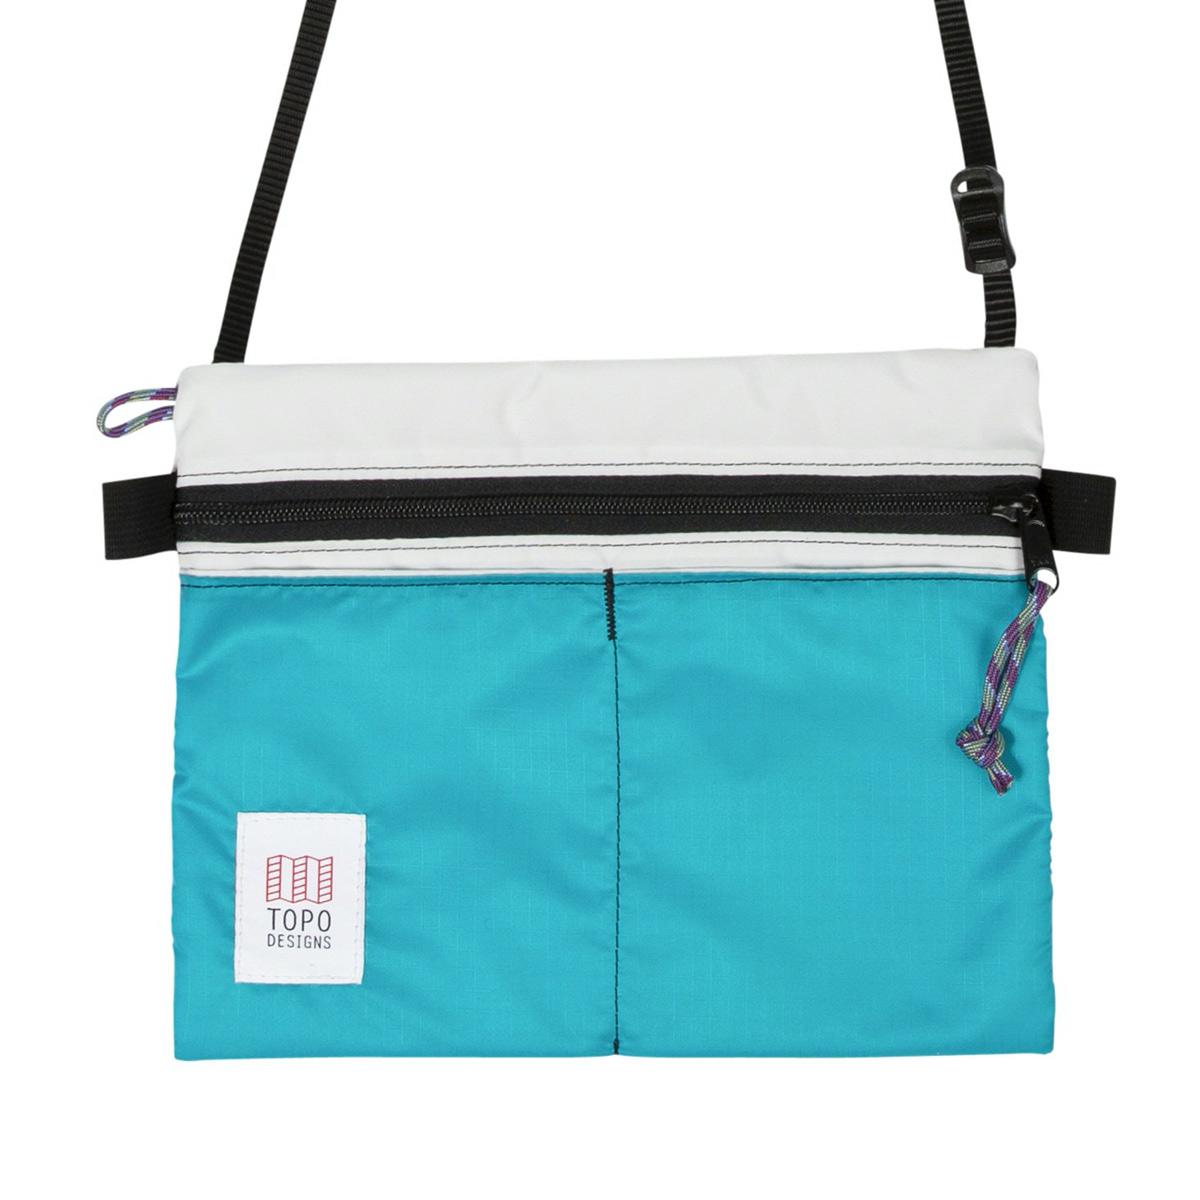 Topo Designs Accessory Shoulder Bag White/Turquoise